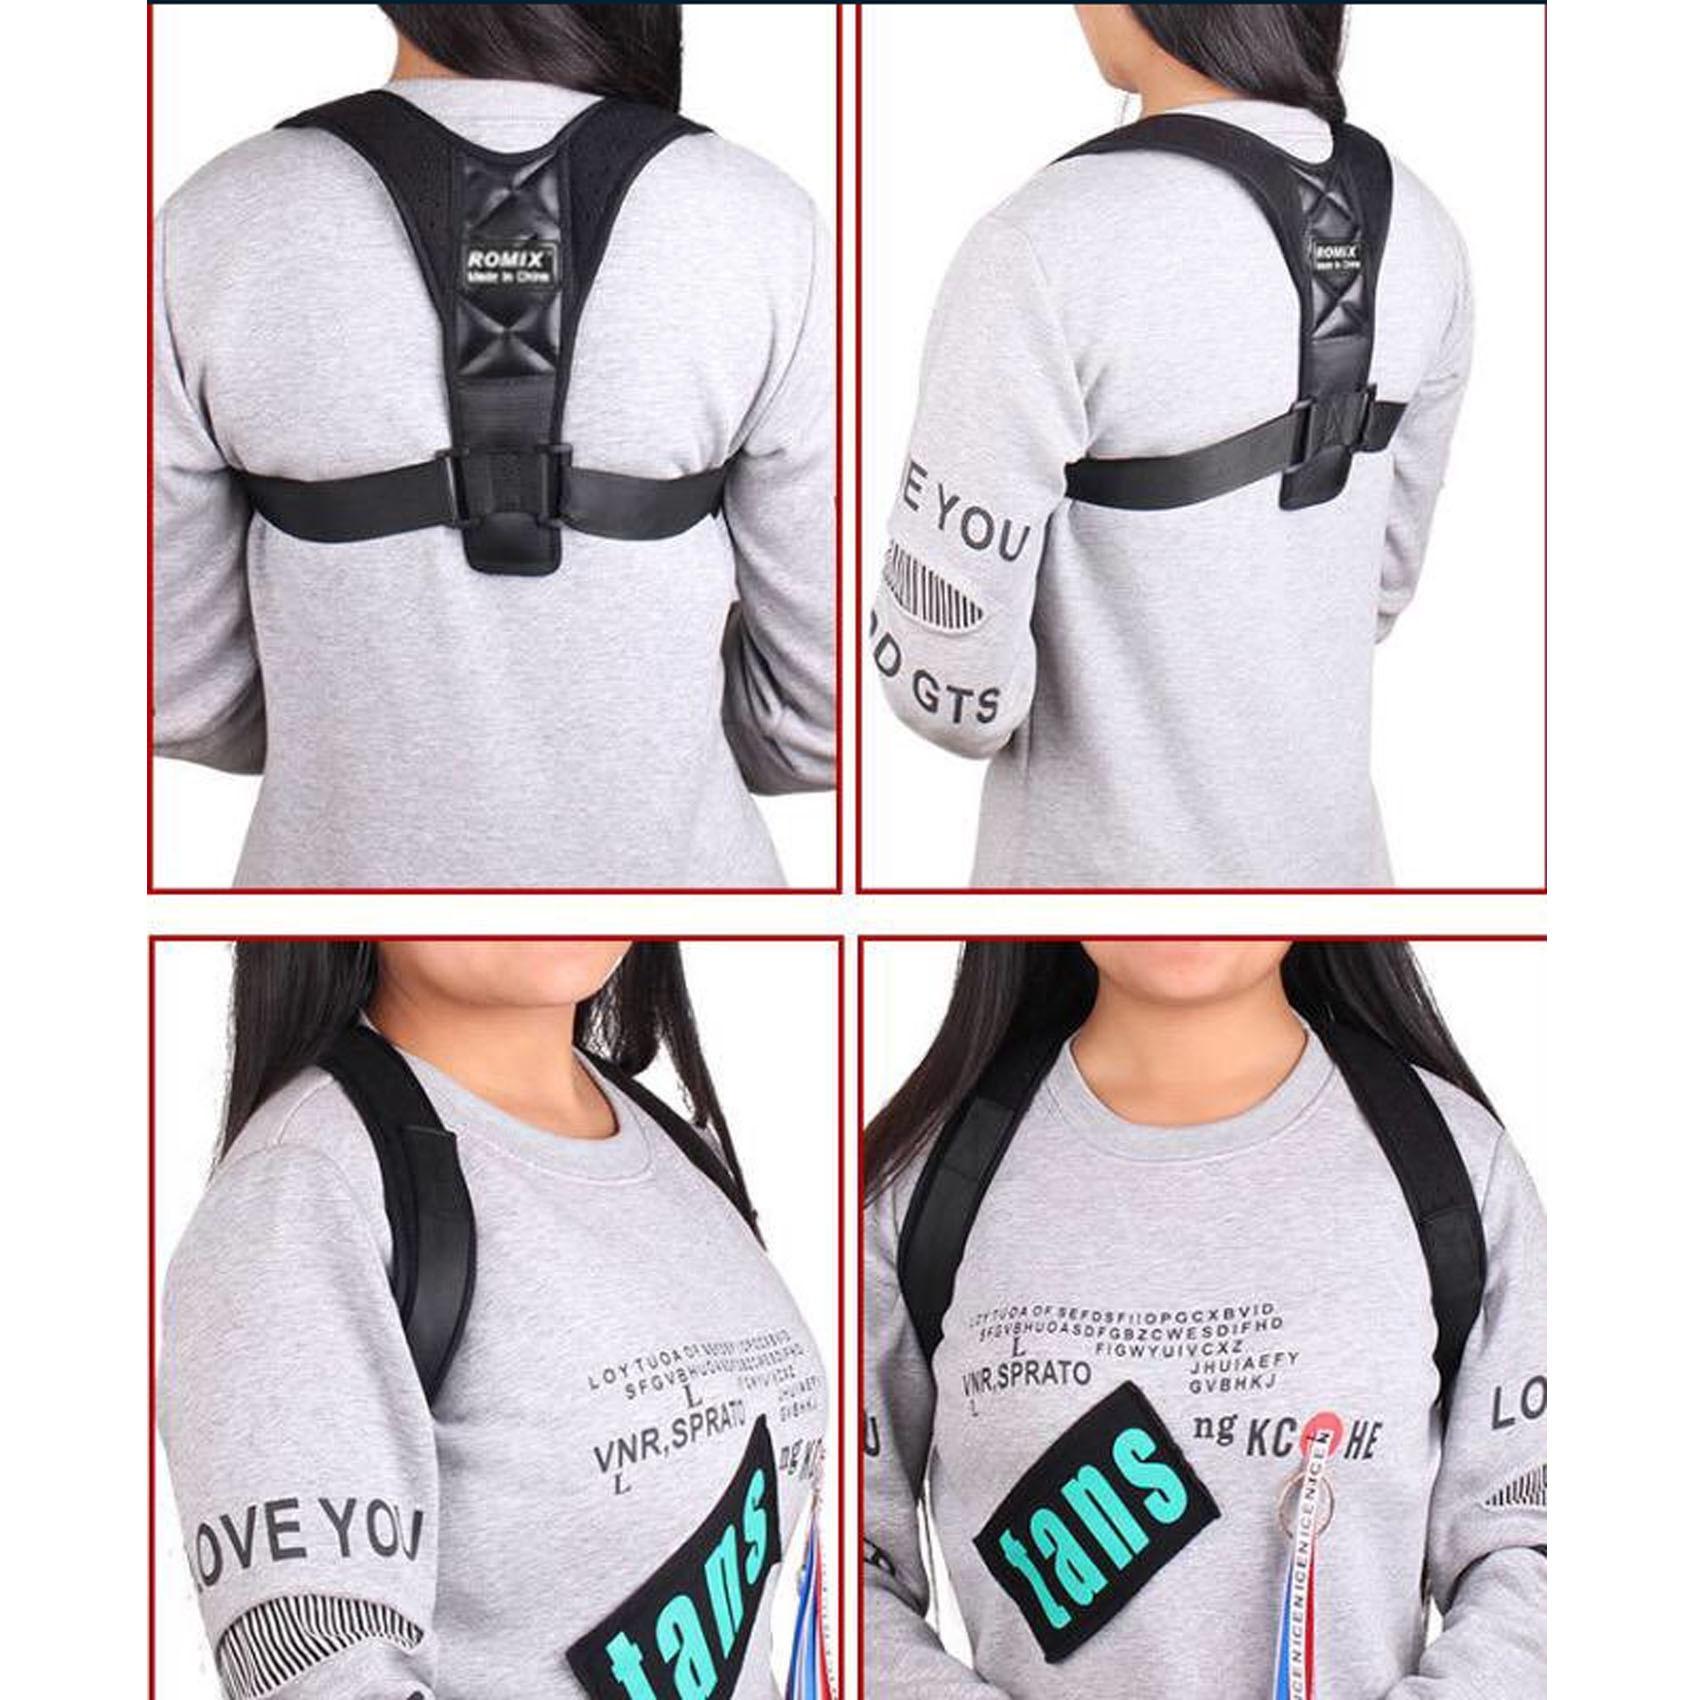 Posture Corrector Support Brace - Black